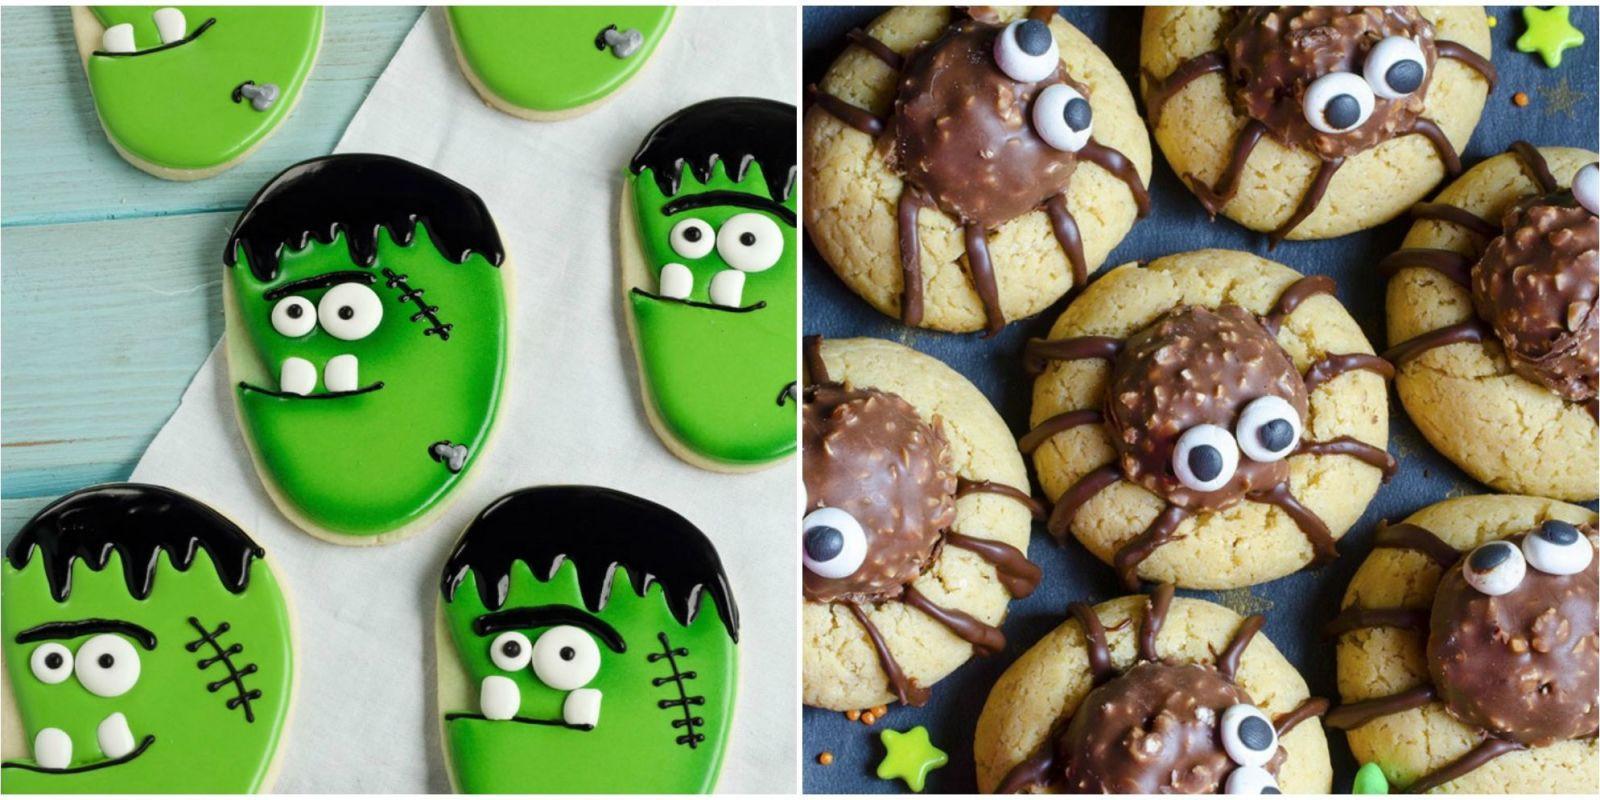 Home Made Halloween Cookies  26 Homemade Halloween Cookie Ideas Recipes & Decorating